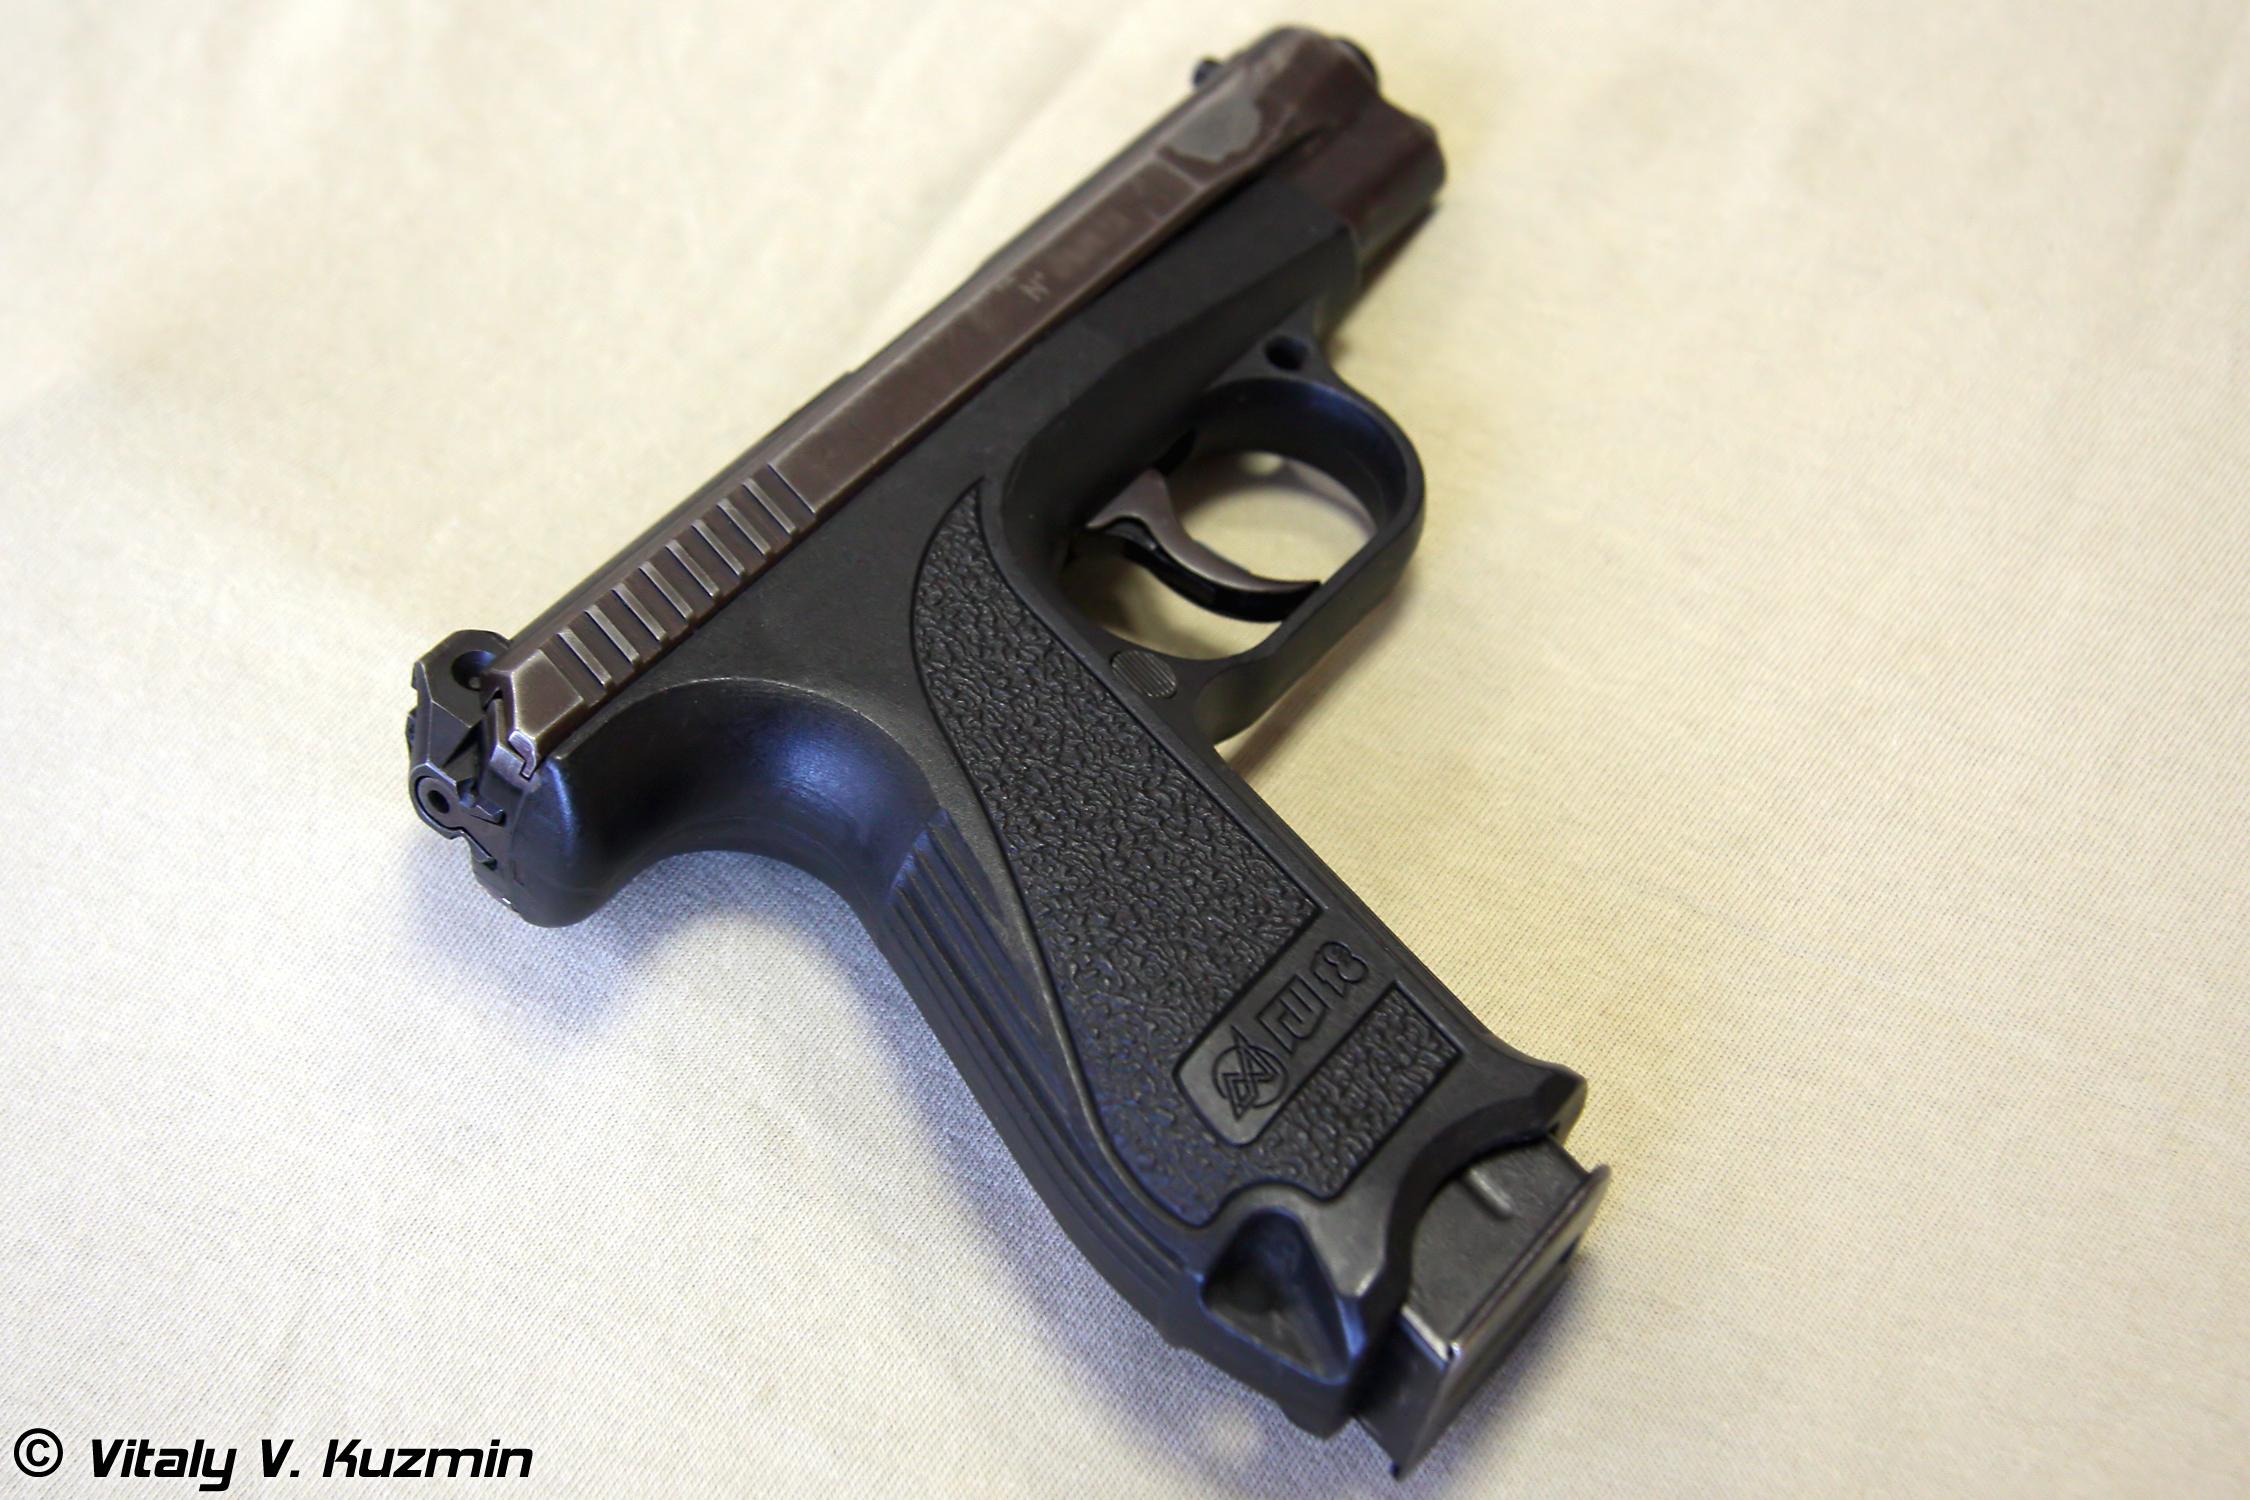 GSh-18 – Forgotten Weapons